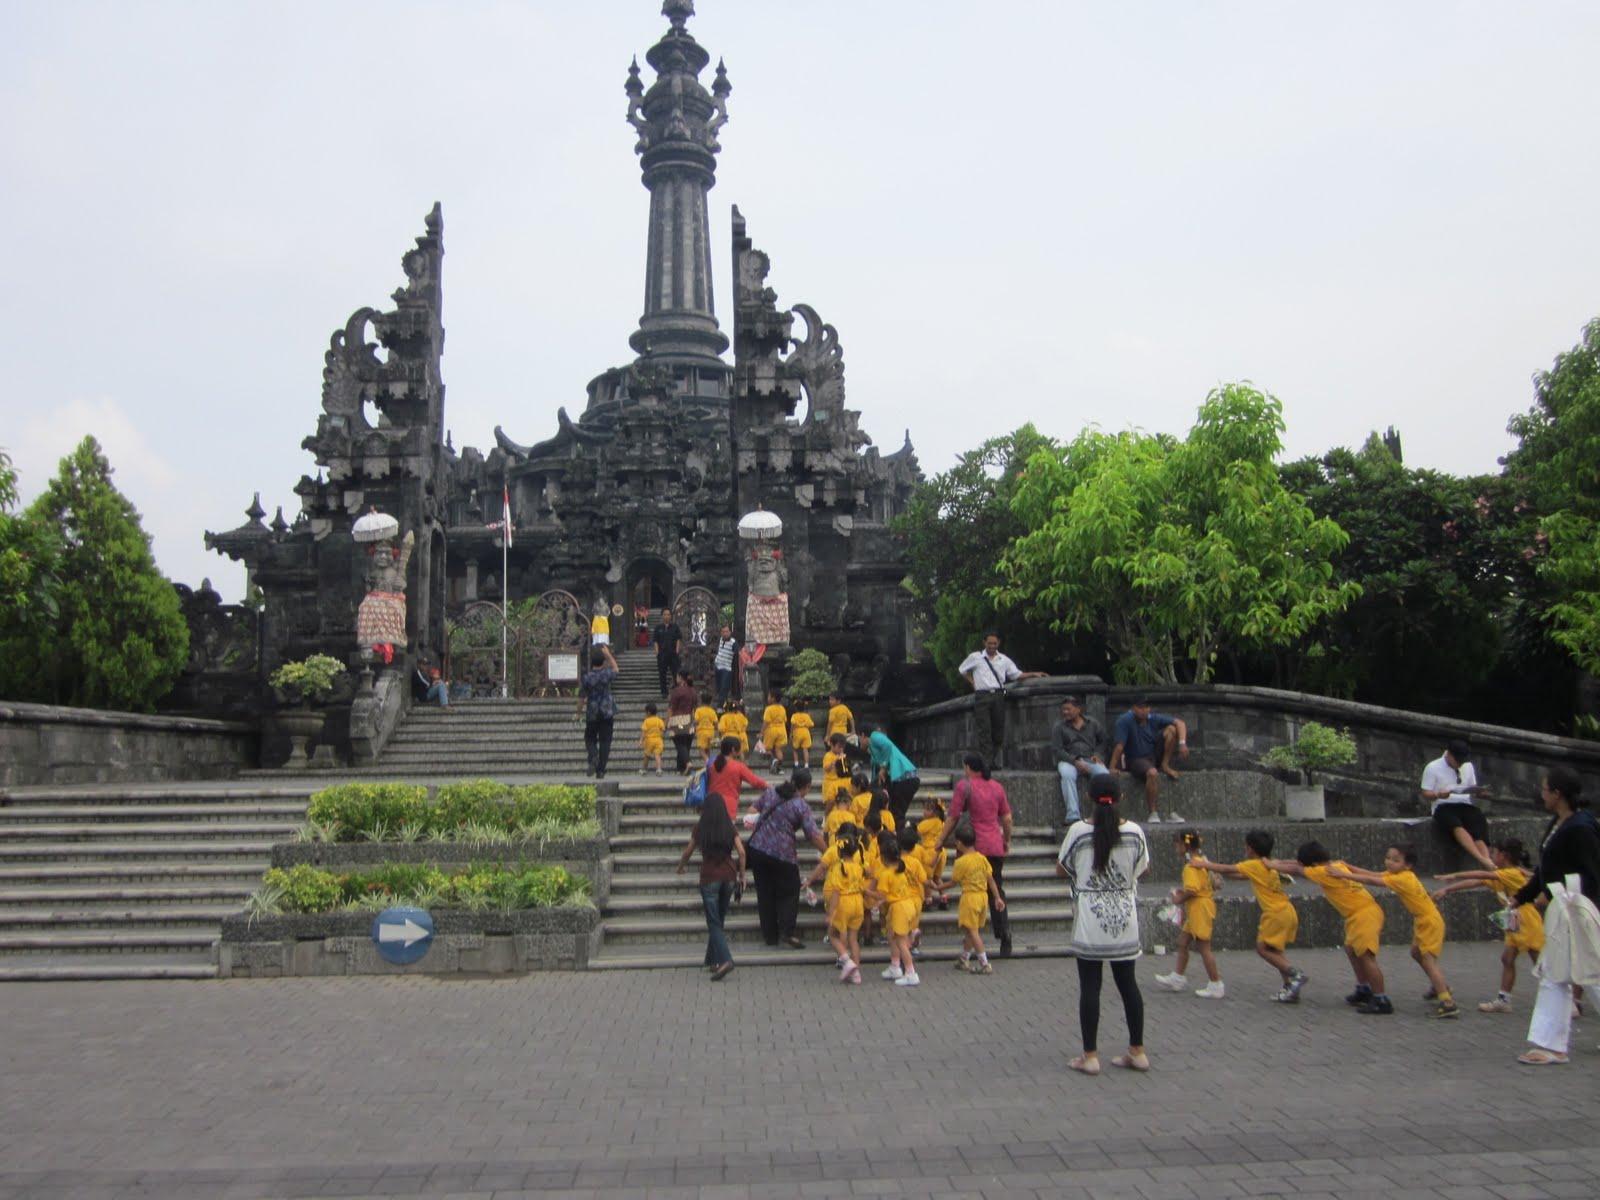 Upt Skb Kota Denpasar Berita Lensa Paudni Harapan Bangsa Dinas